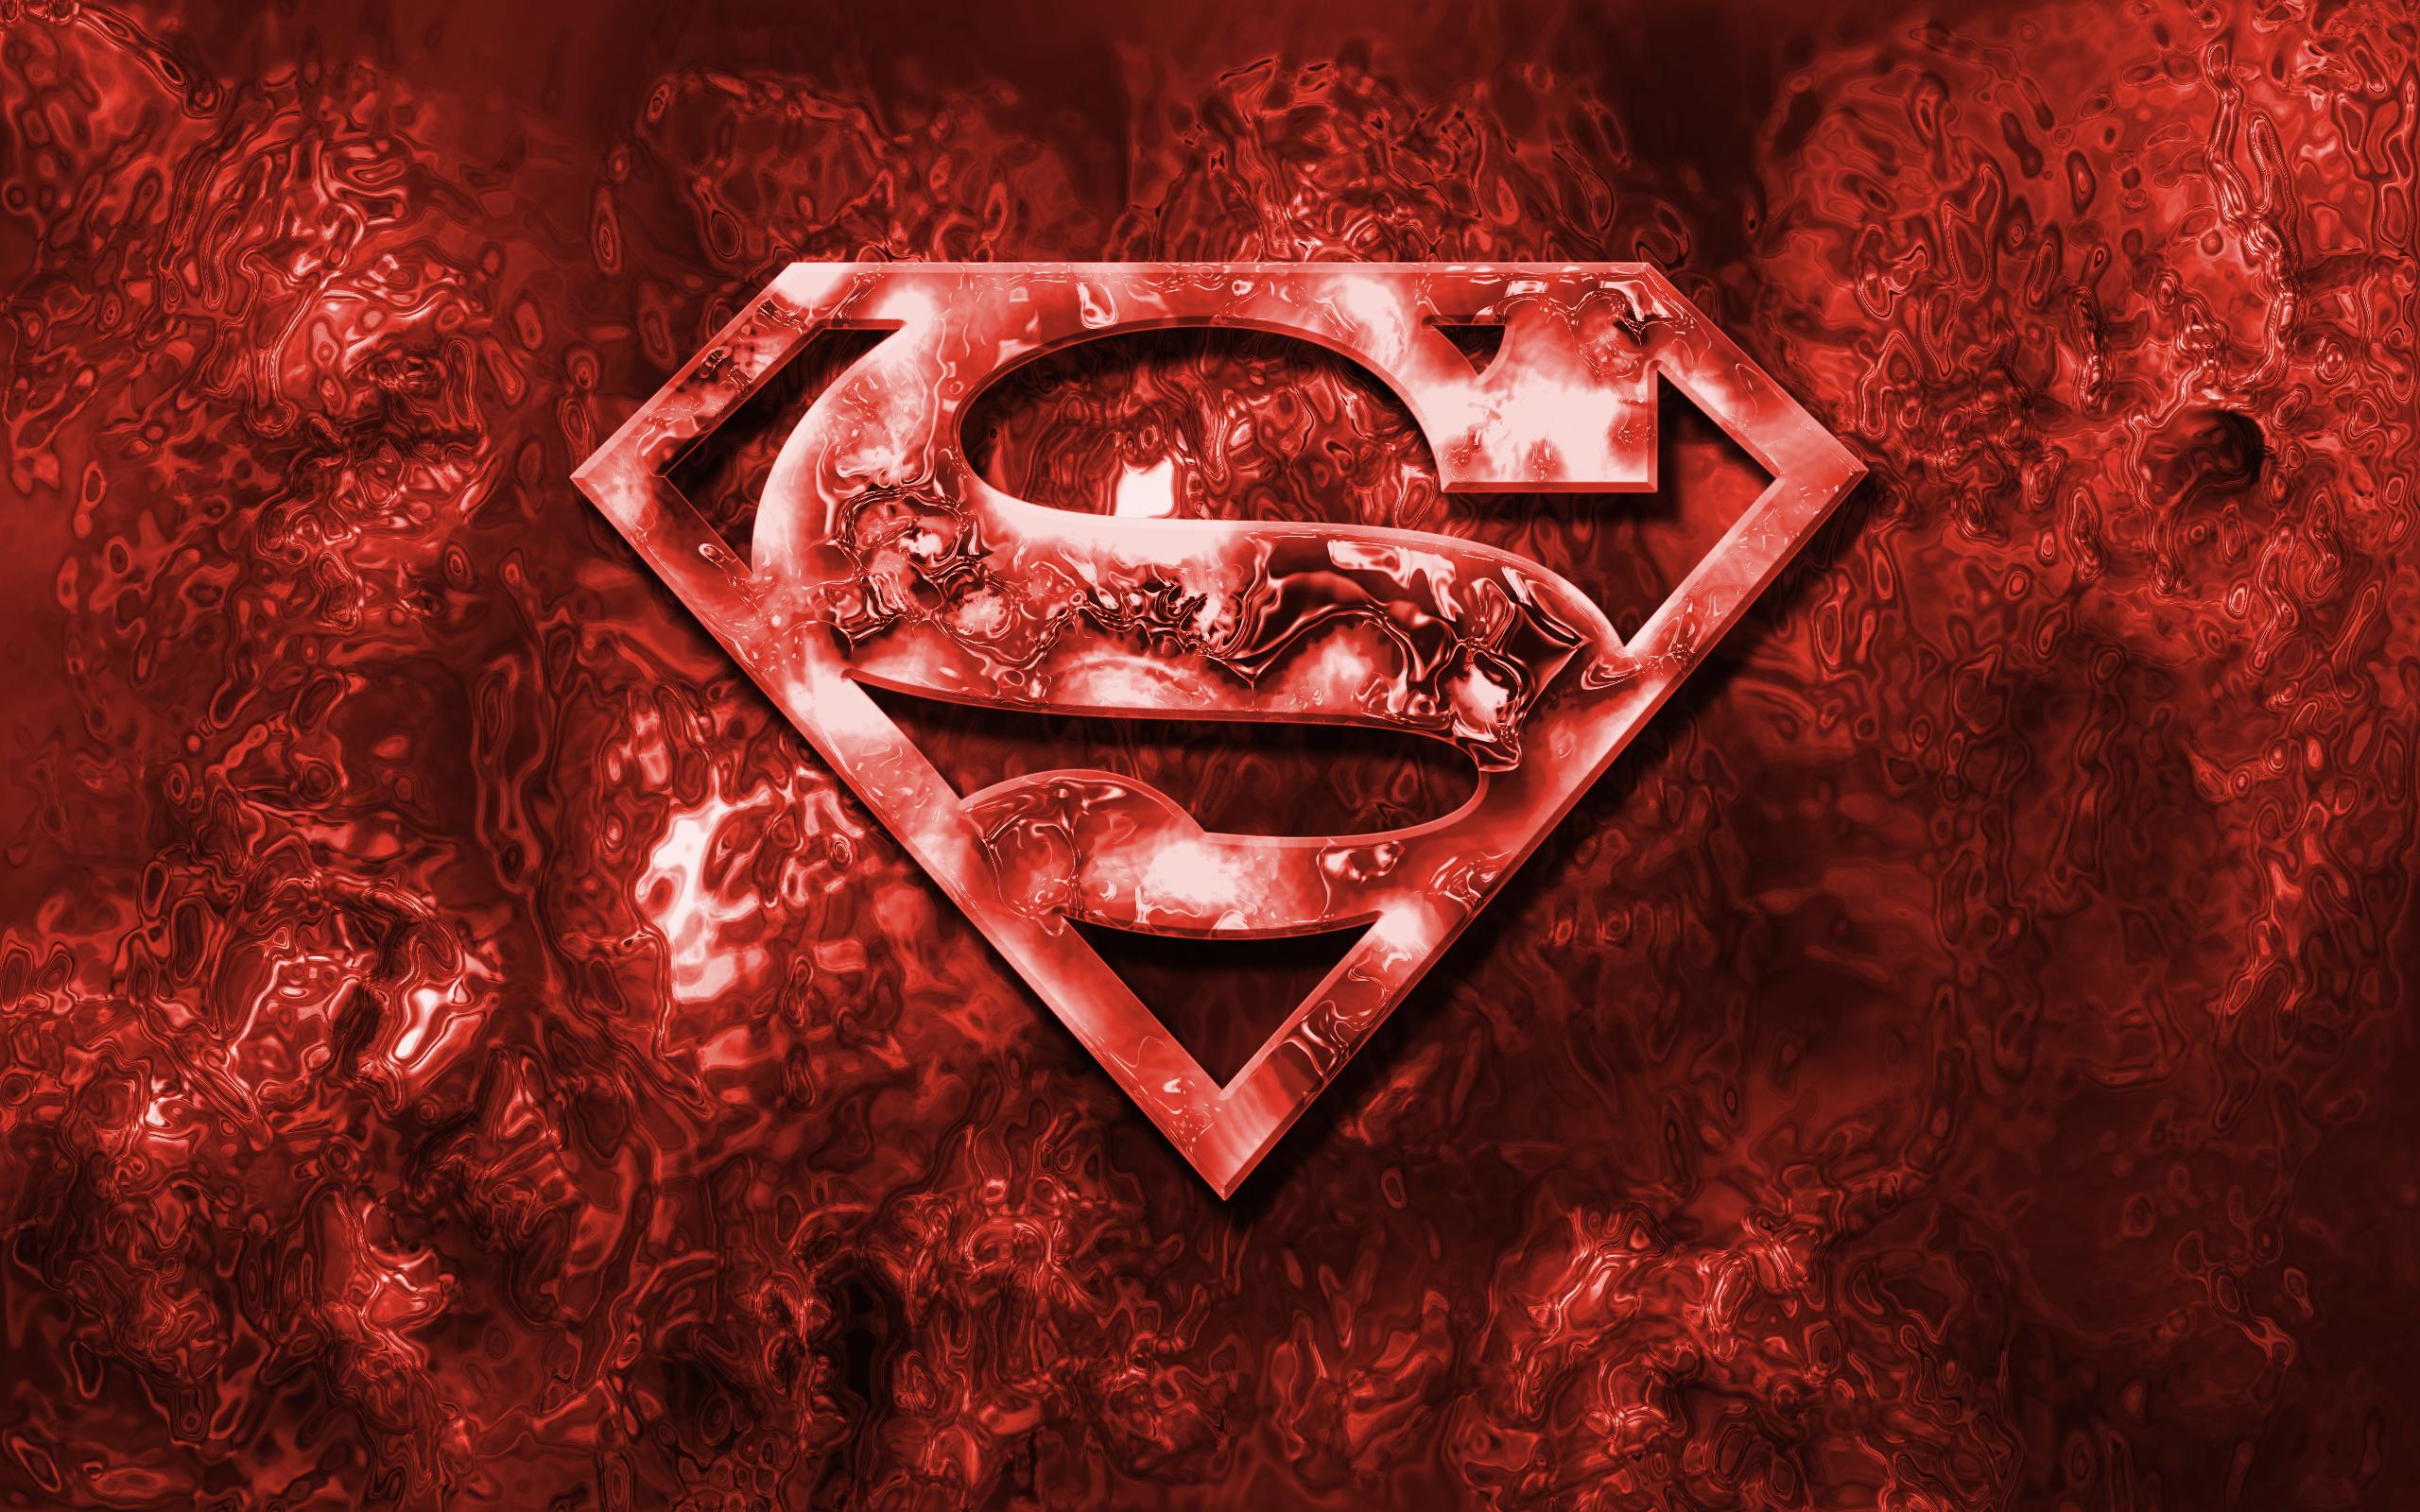 Wallpaper Abyss Explore the Collection Superman Comics Superman 64152 2560x1600